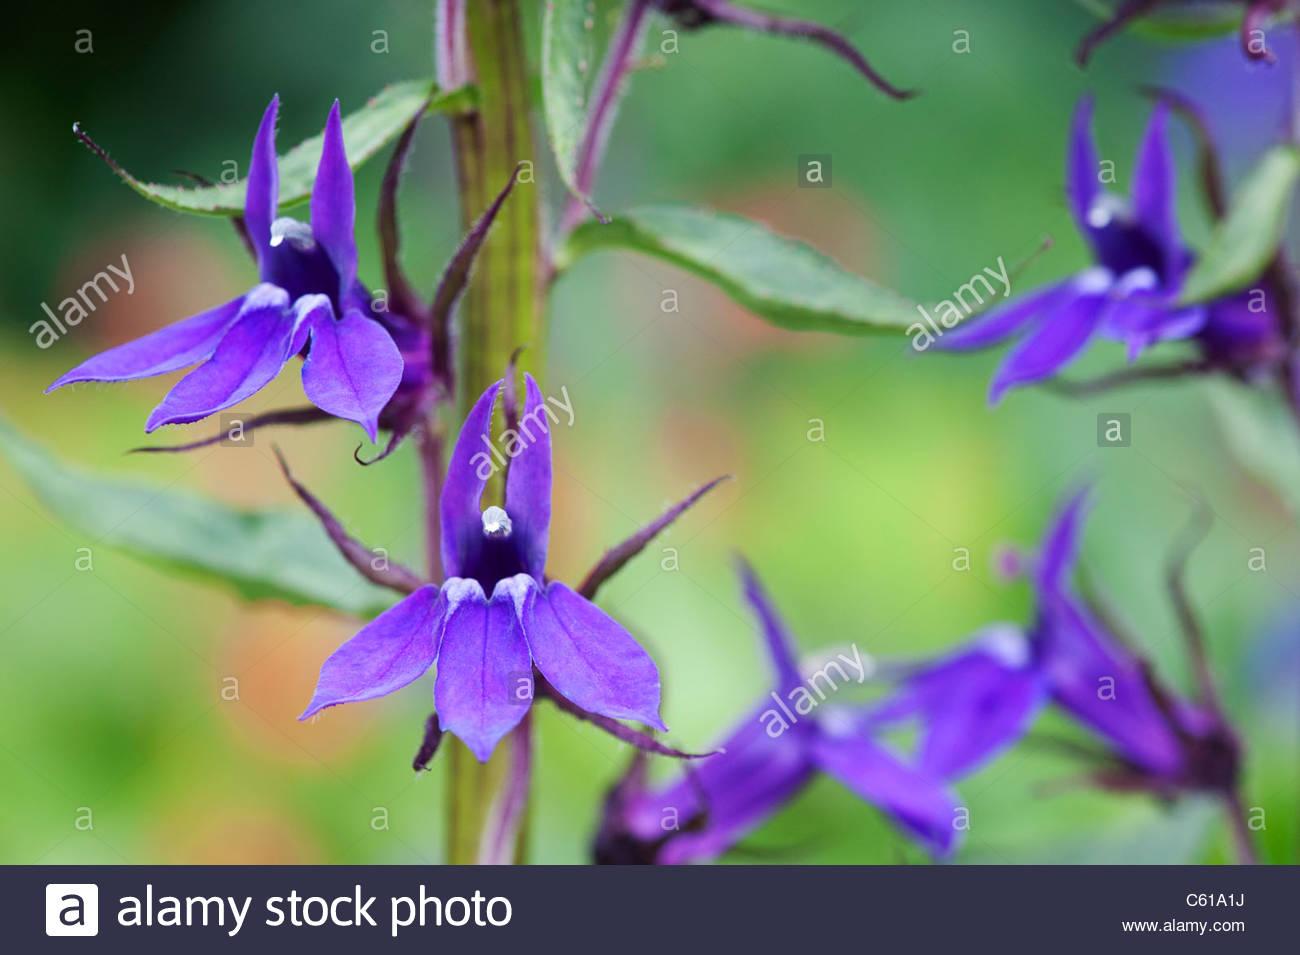 Lobelia × speciosa 'Vedrariensis'. Lobelia 'Vedrariensis' flower - Stock Image